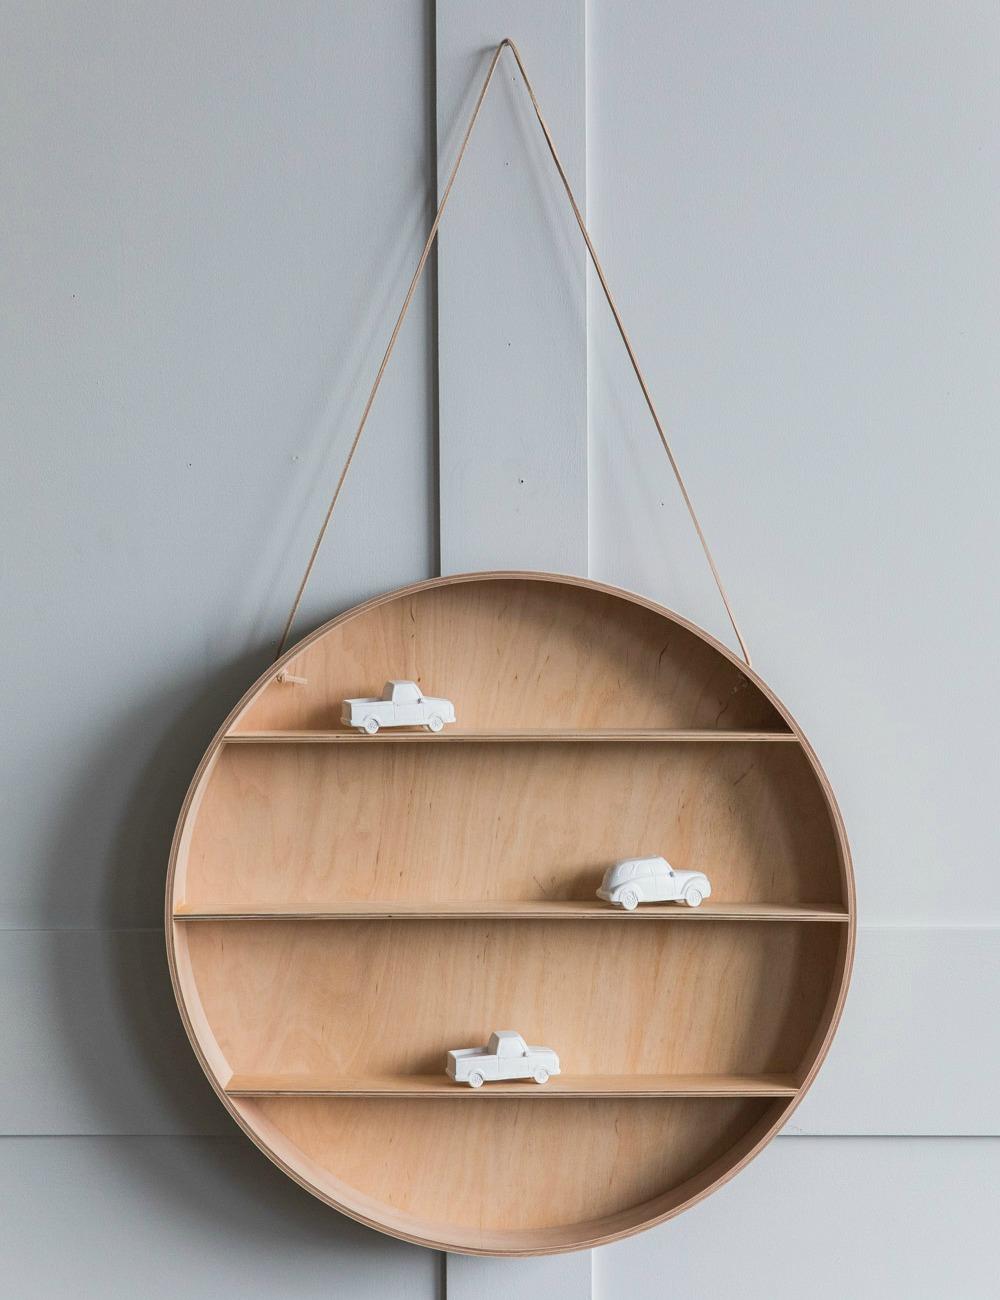 Circular Wooden Shelf 2 copy.jpg